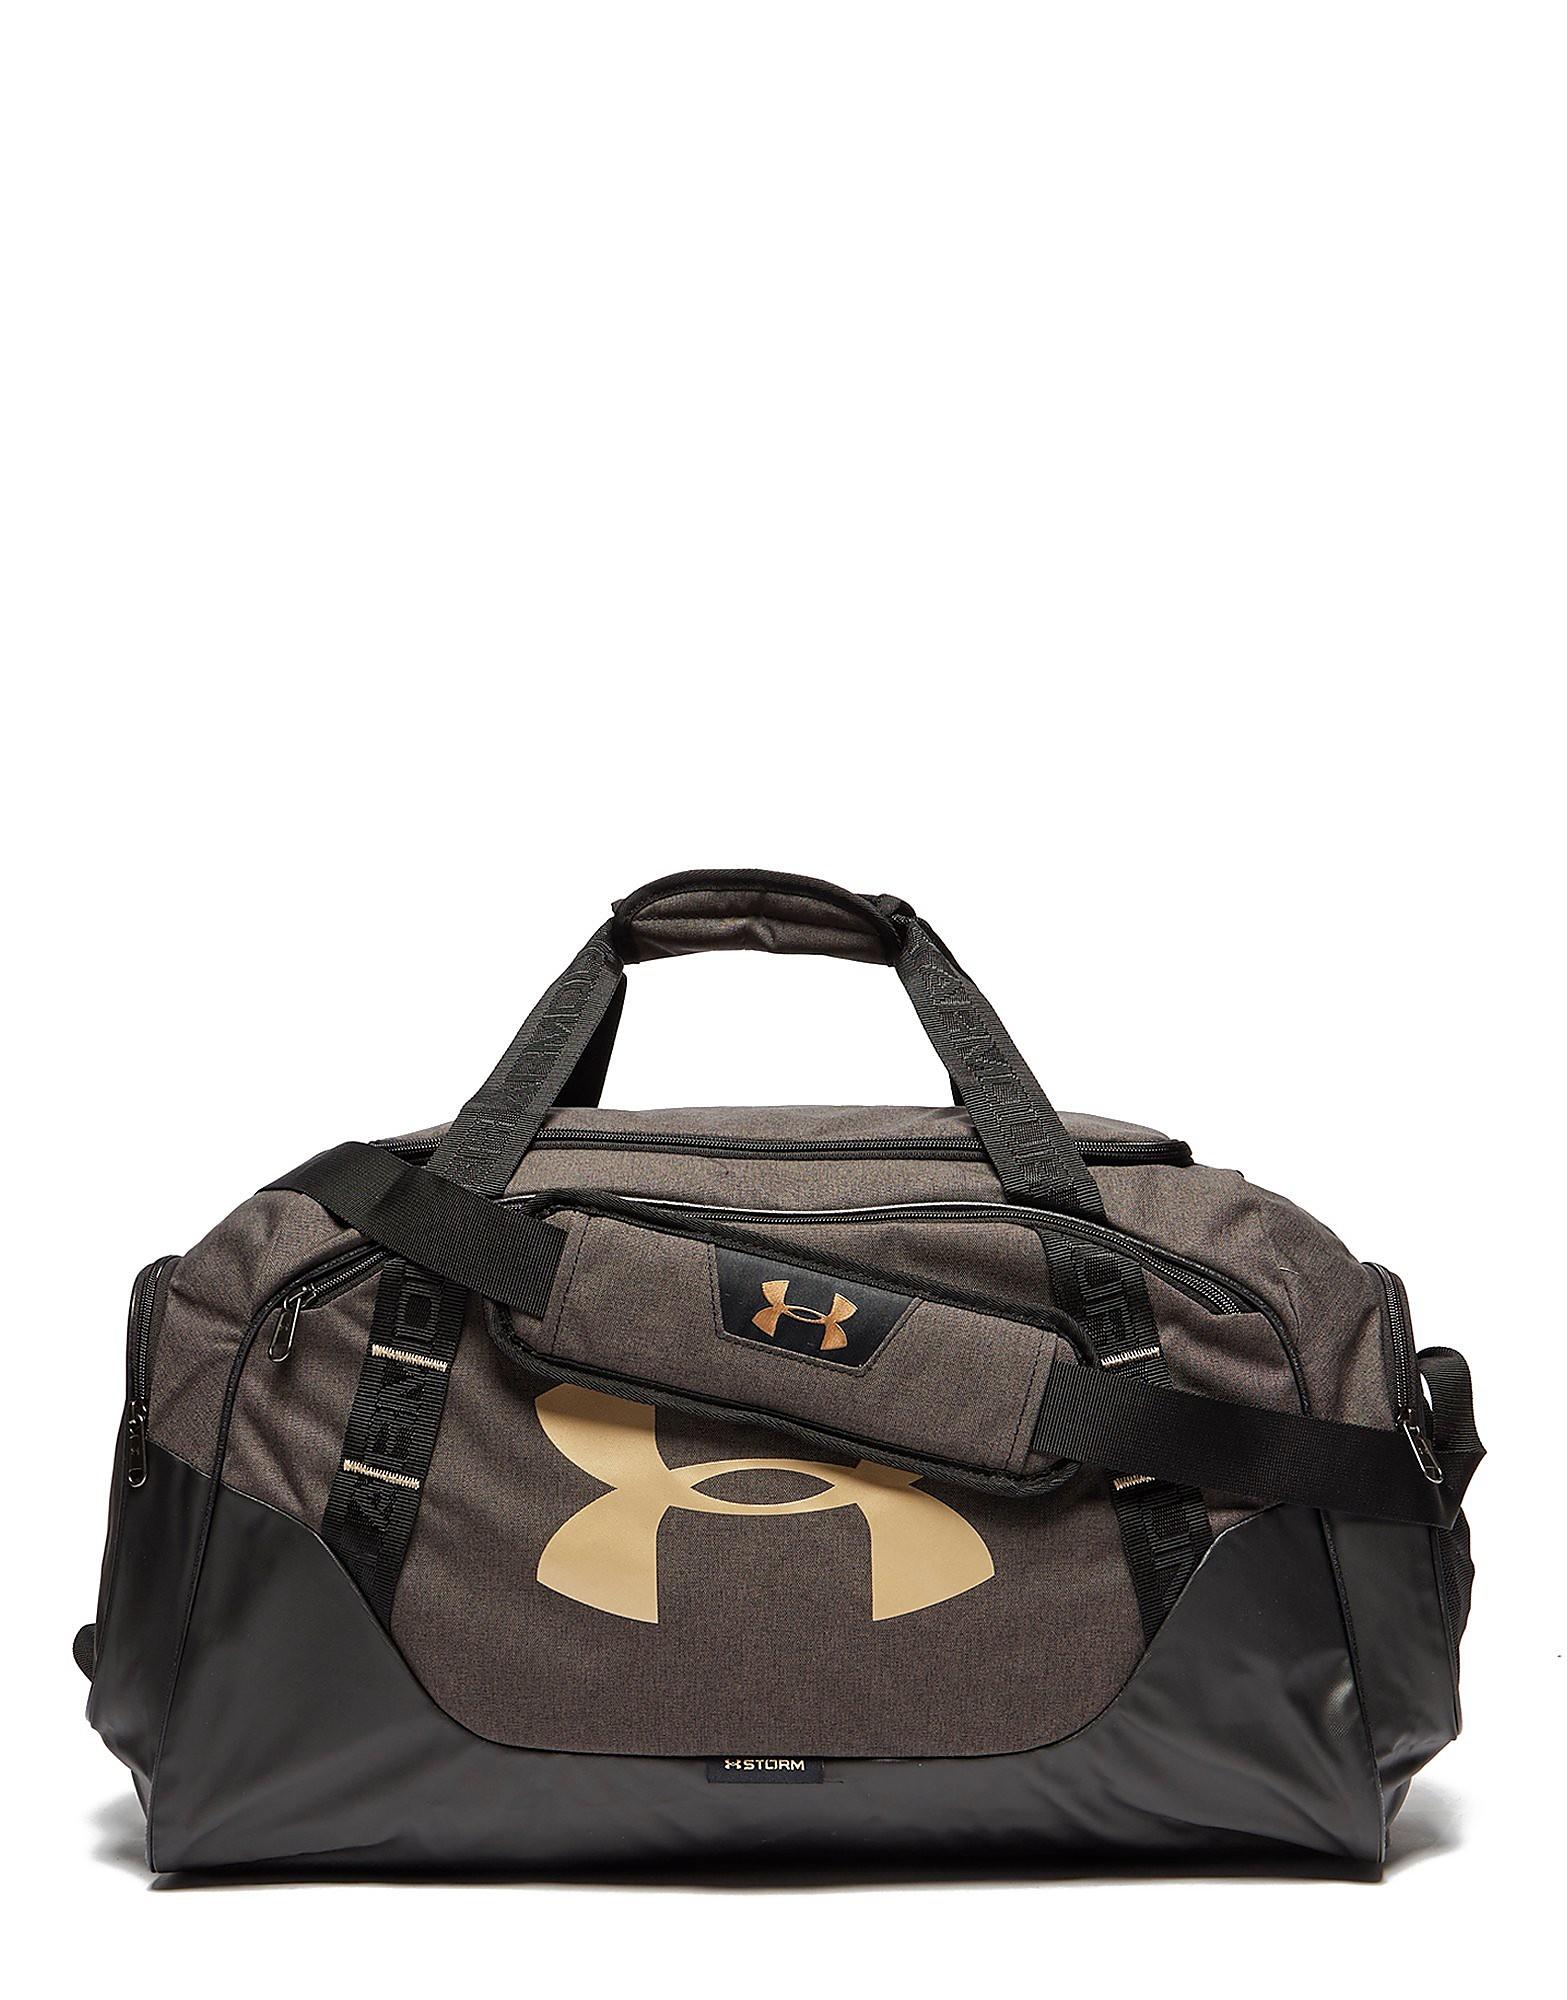 Under Armour Undeniable Medium Duffle Bag Braun Gold/Schwarz